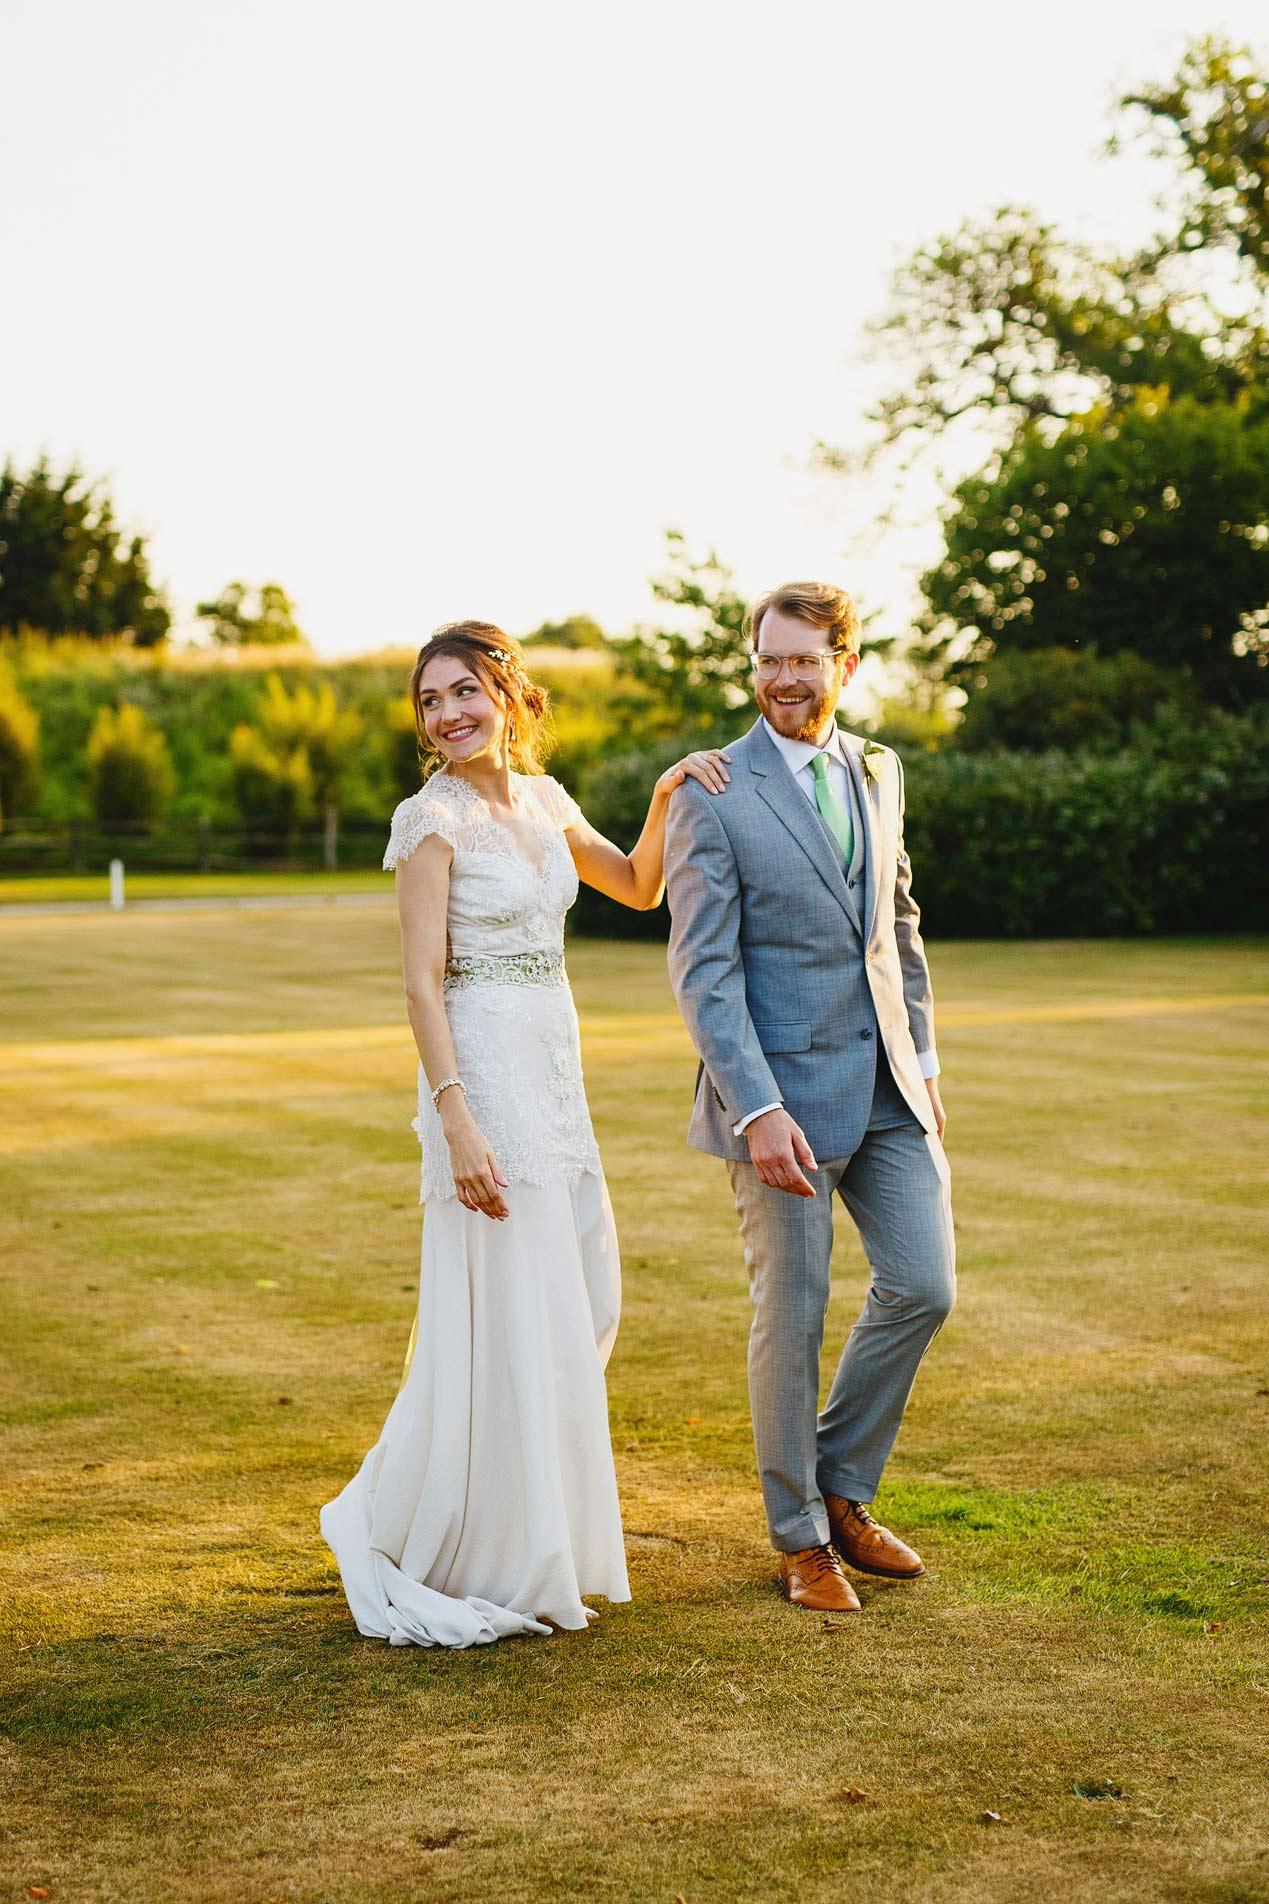 London_wedding_photographer_16